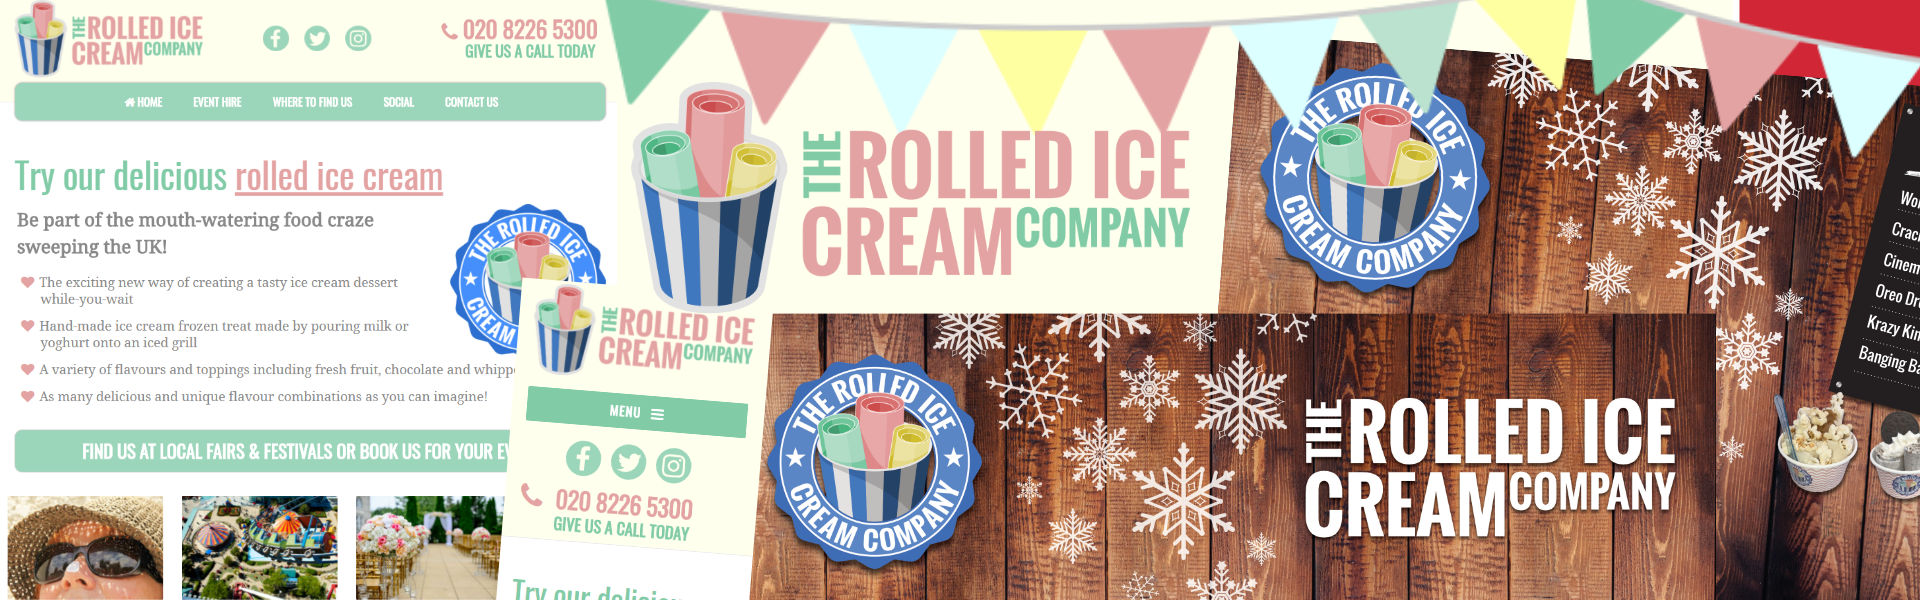 Rolled Ice Cream Design Case Study